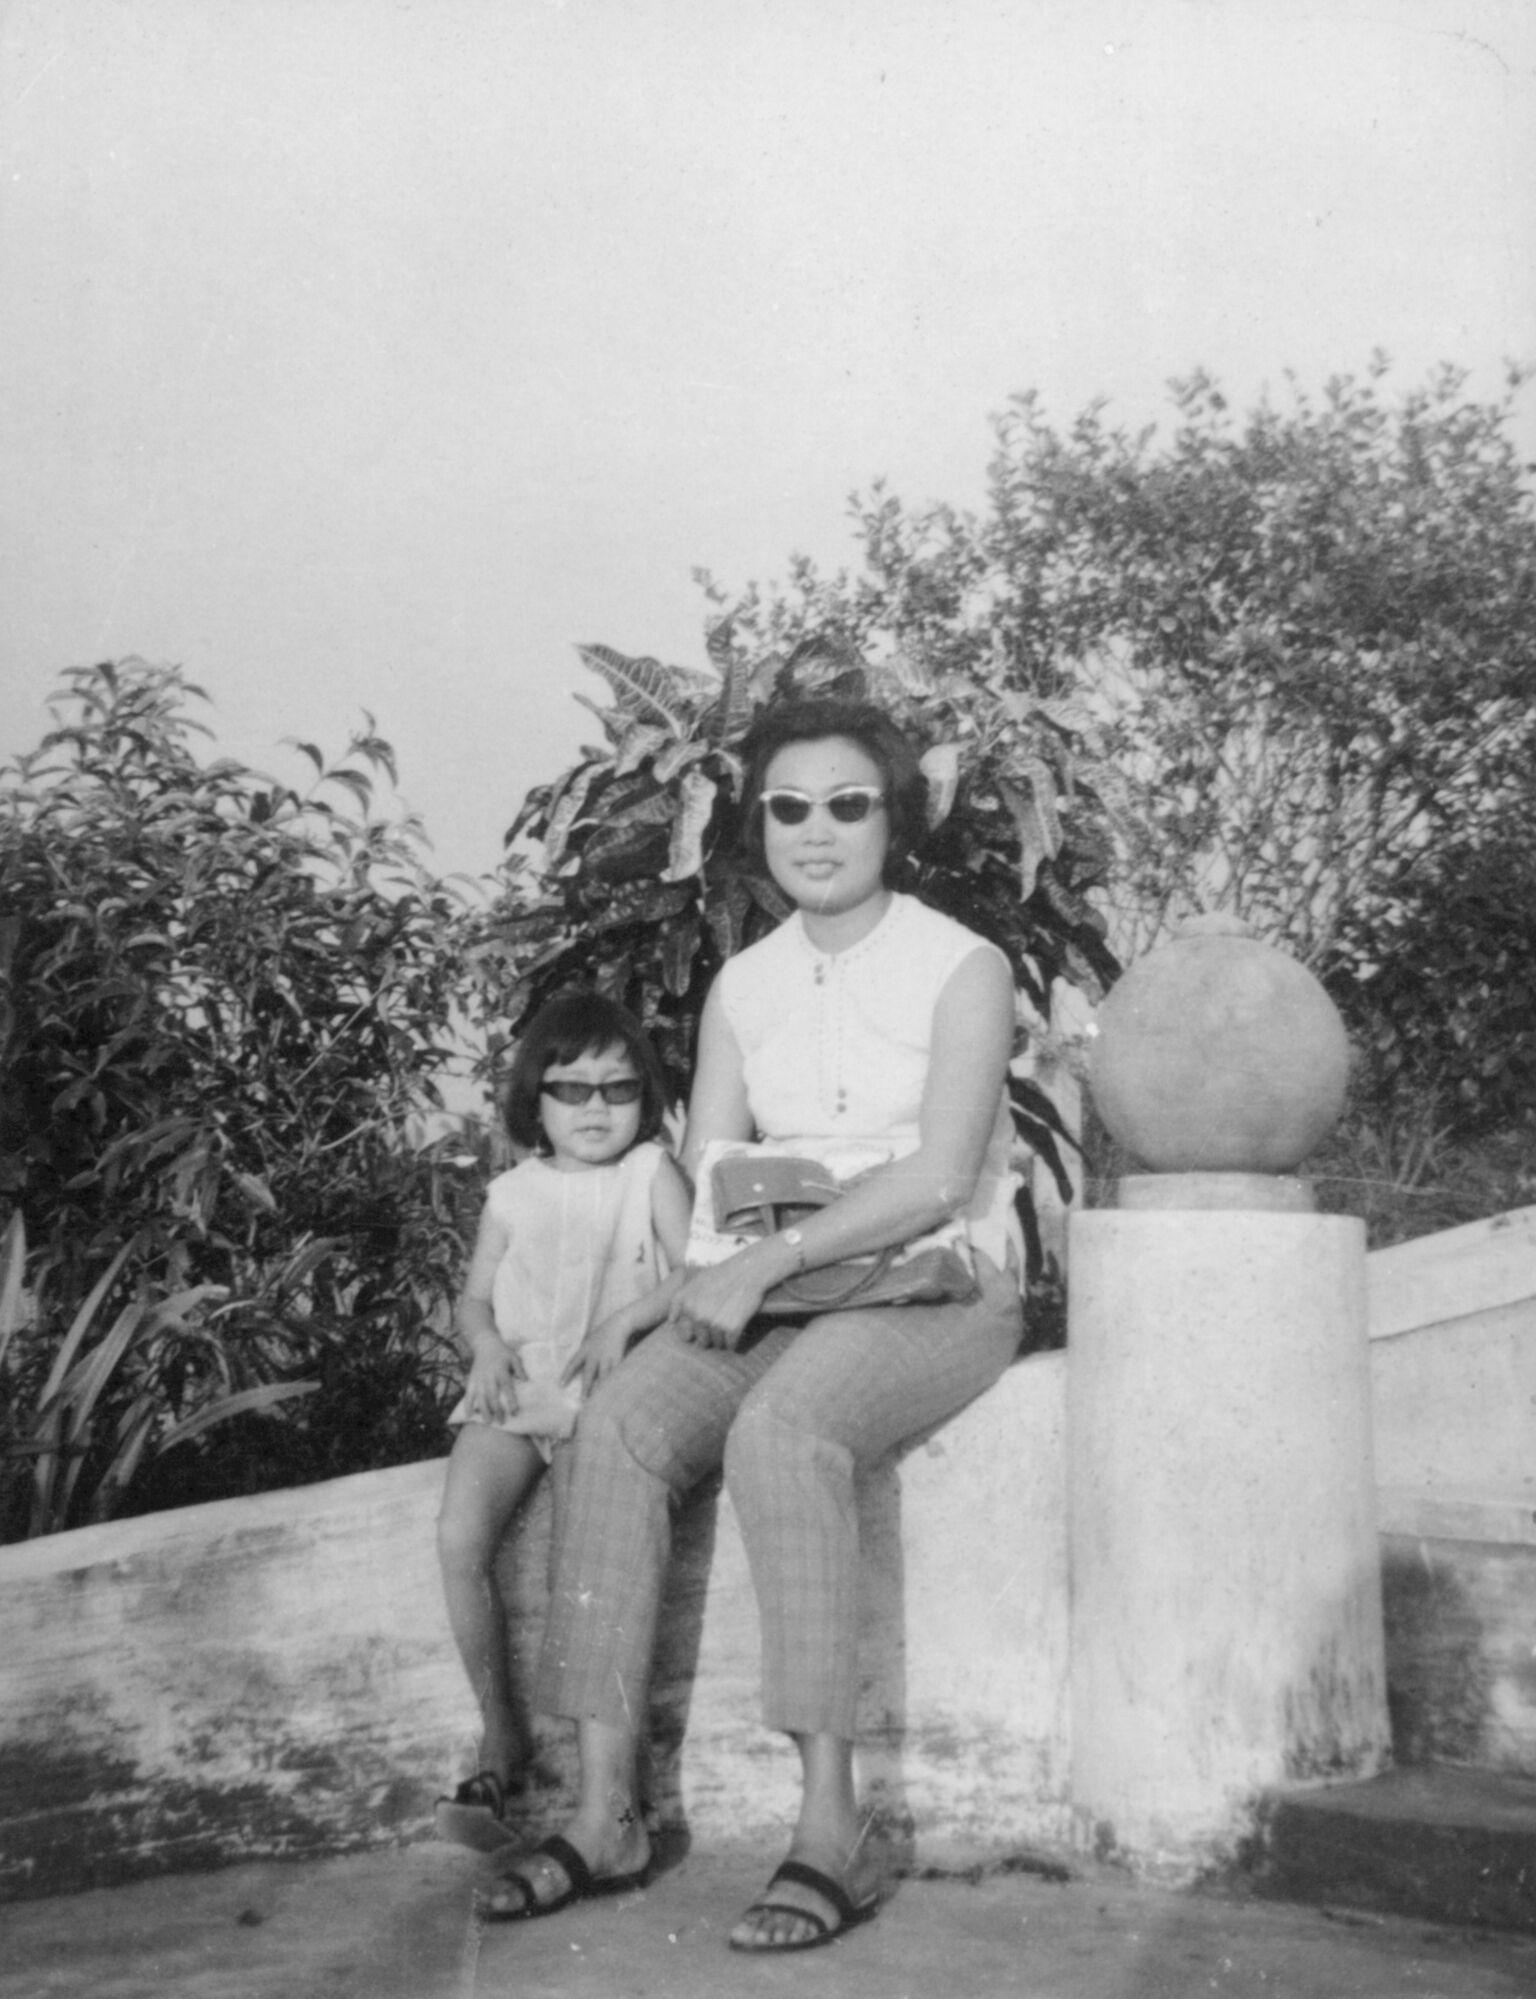 Grandma and mum BW.jpeg